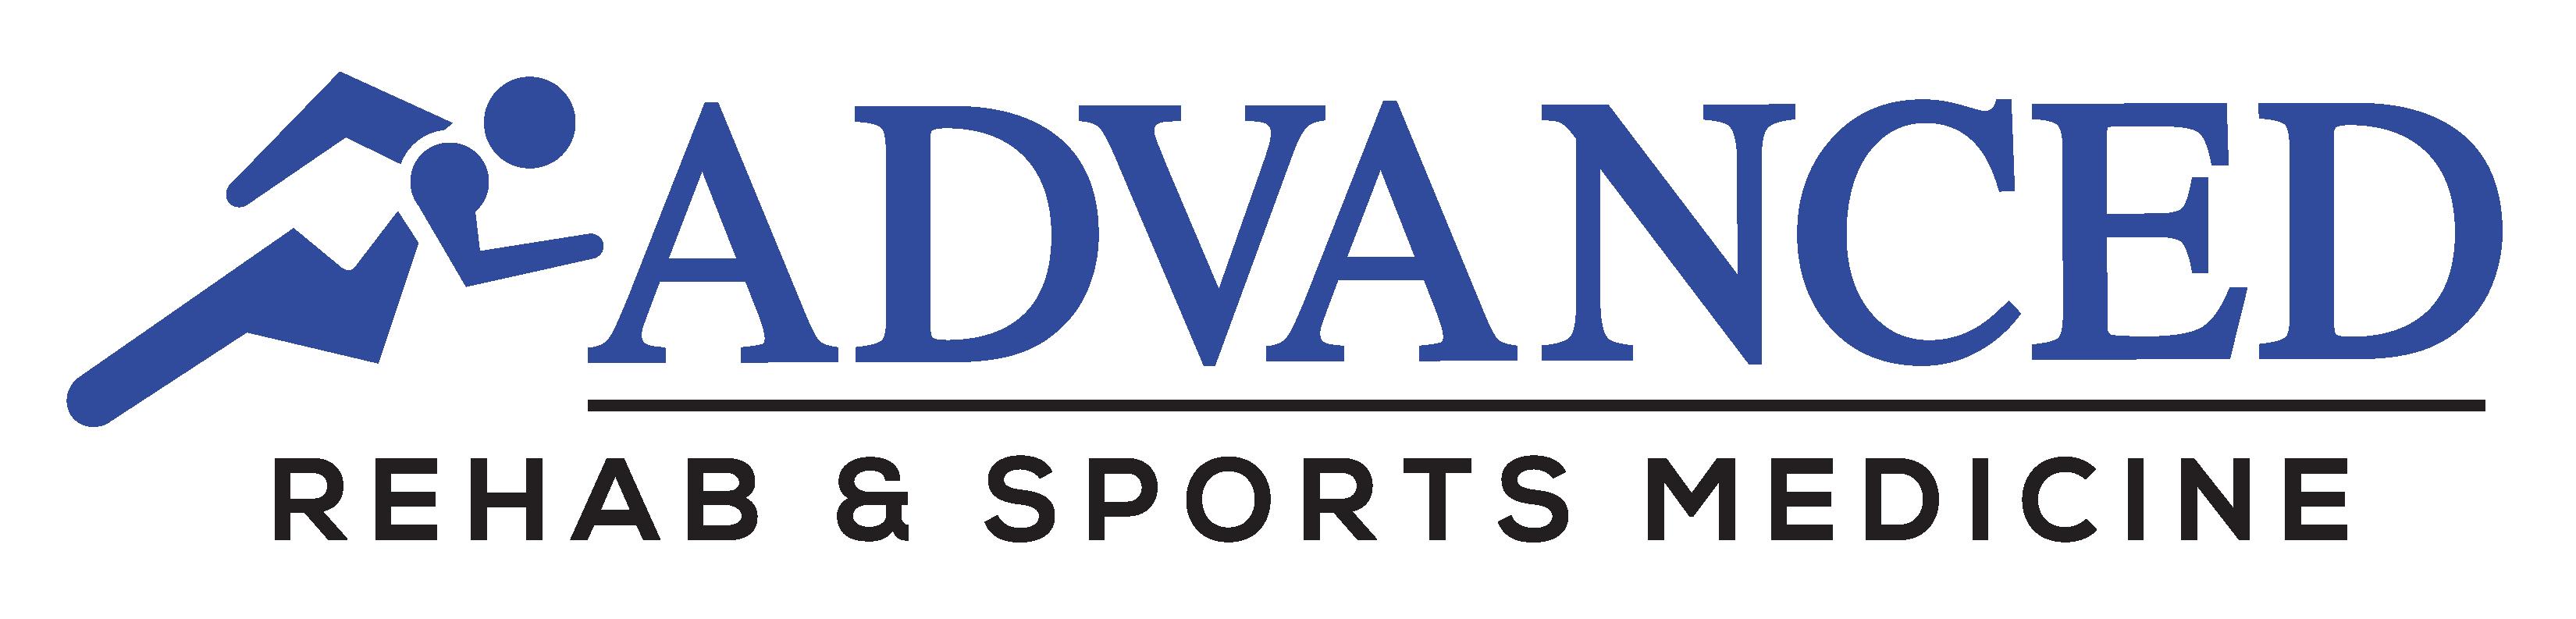 Advanced Rehab & Sports Medicine Services